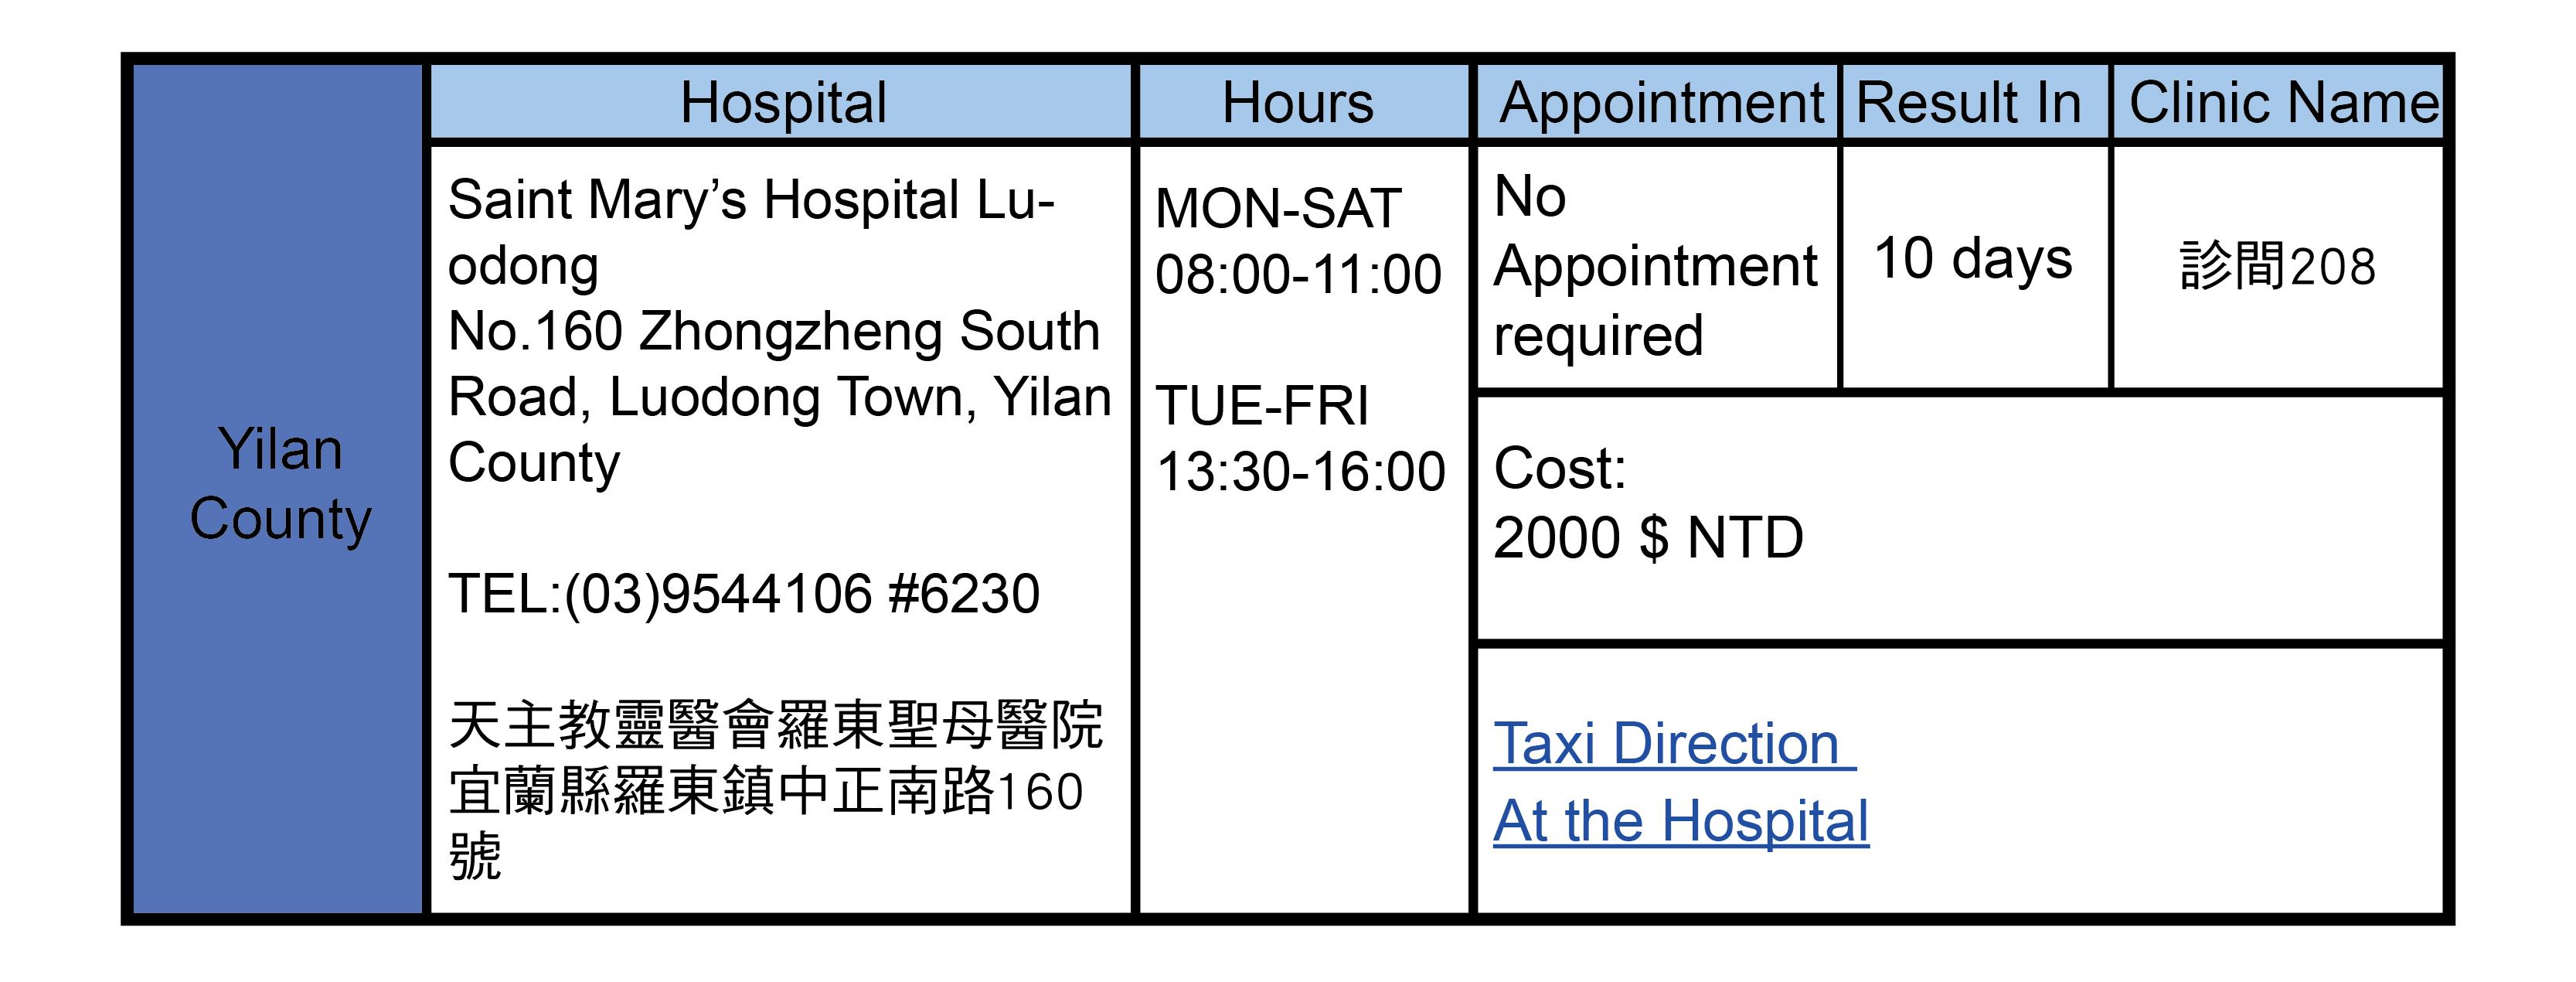 Yilan County, Taiwan Health Check Hospitals Addresses